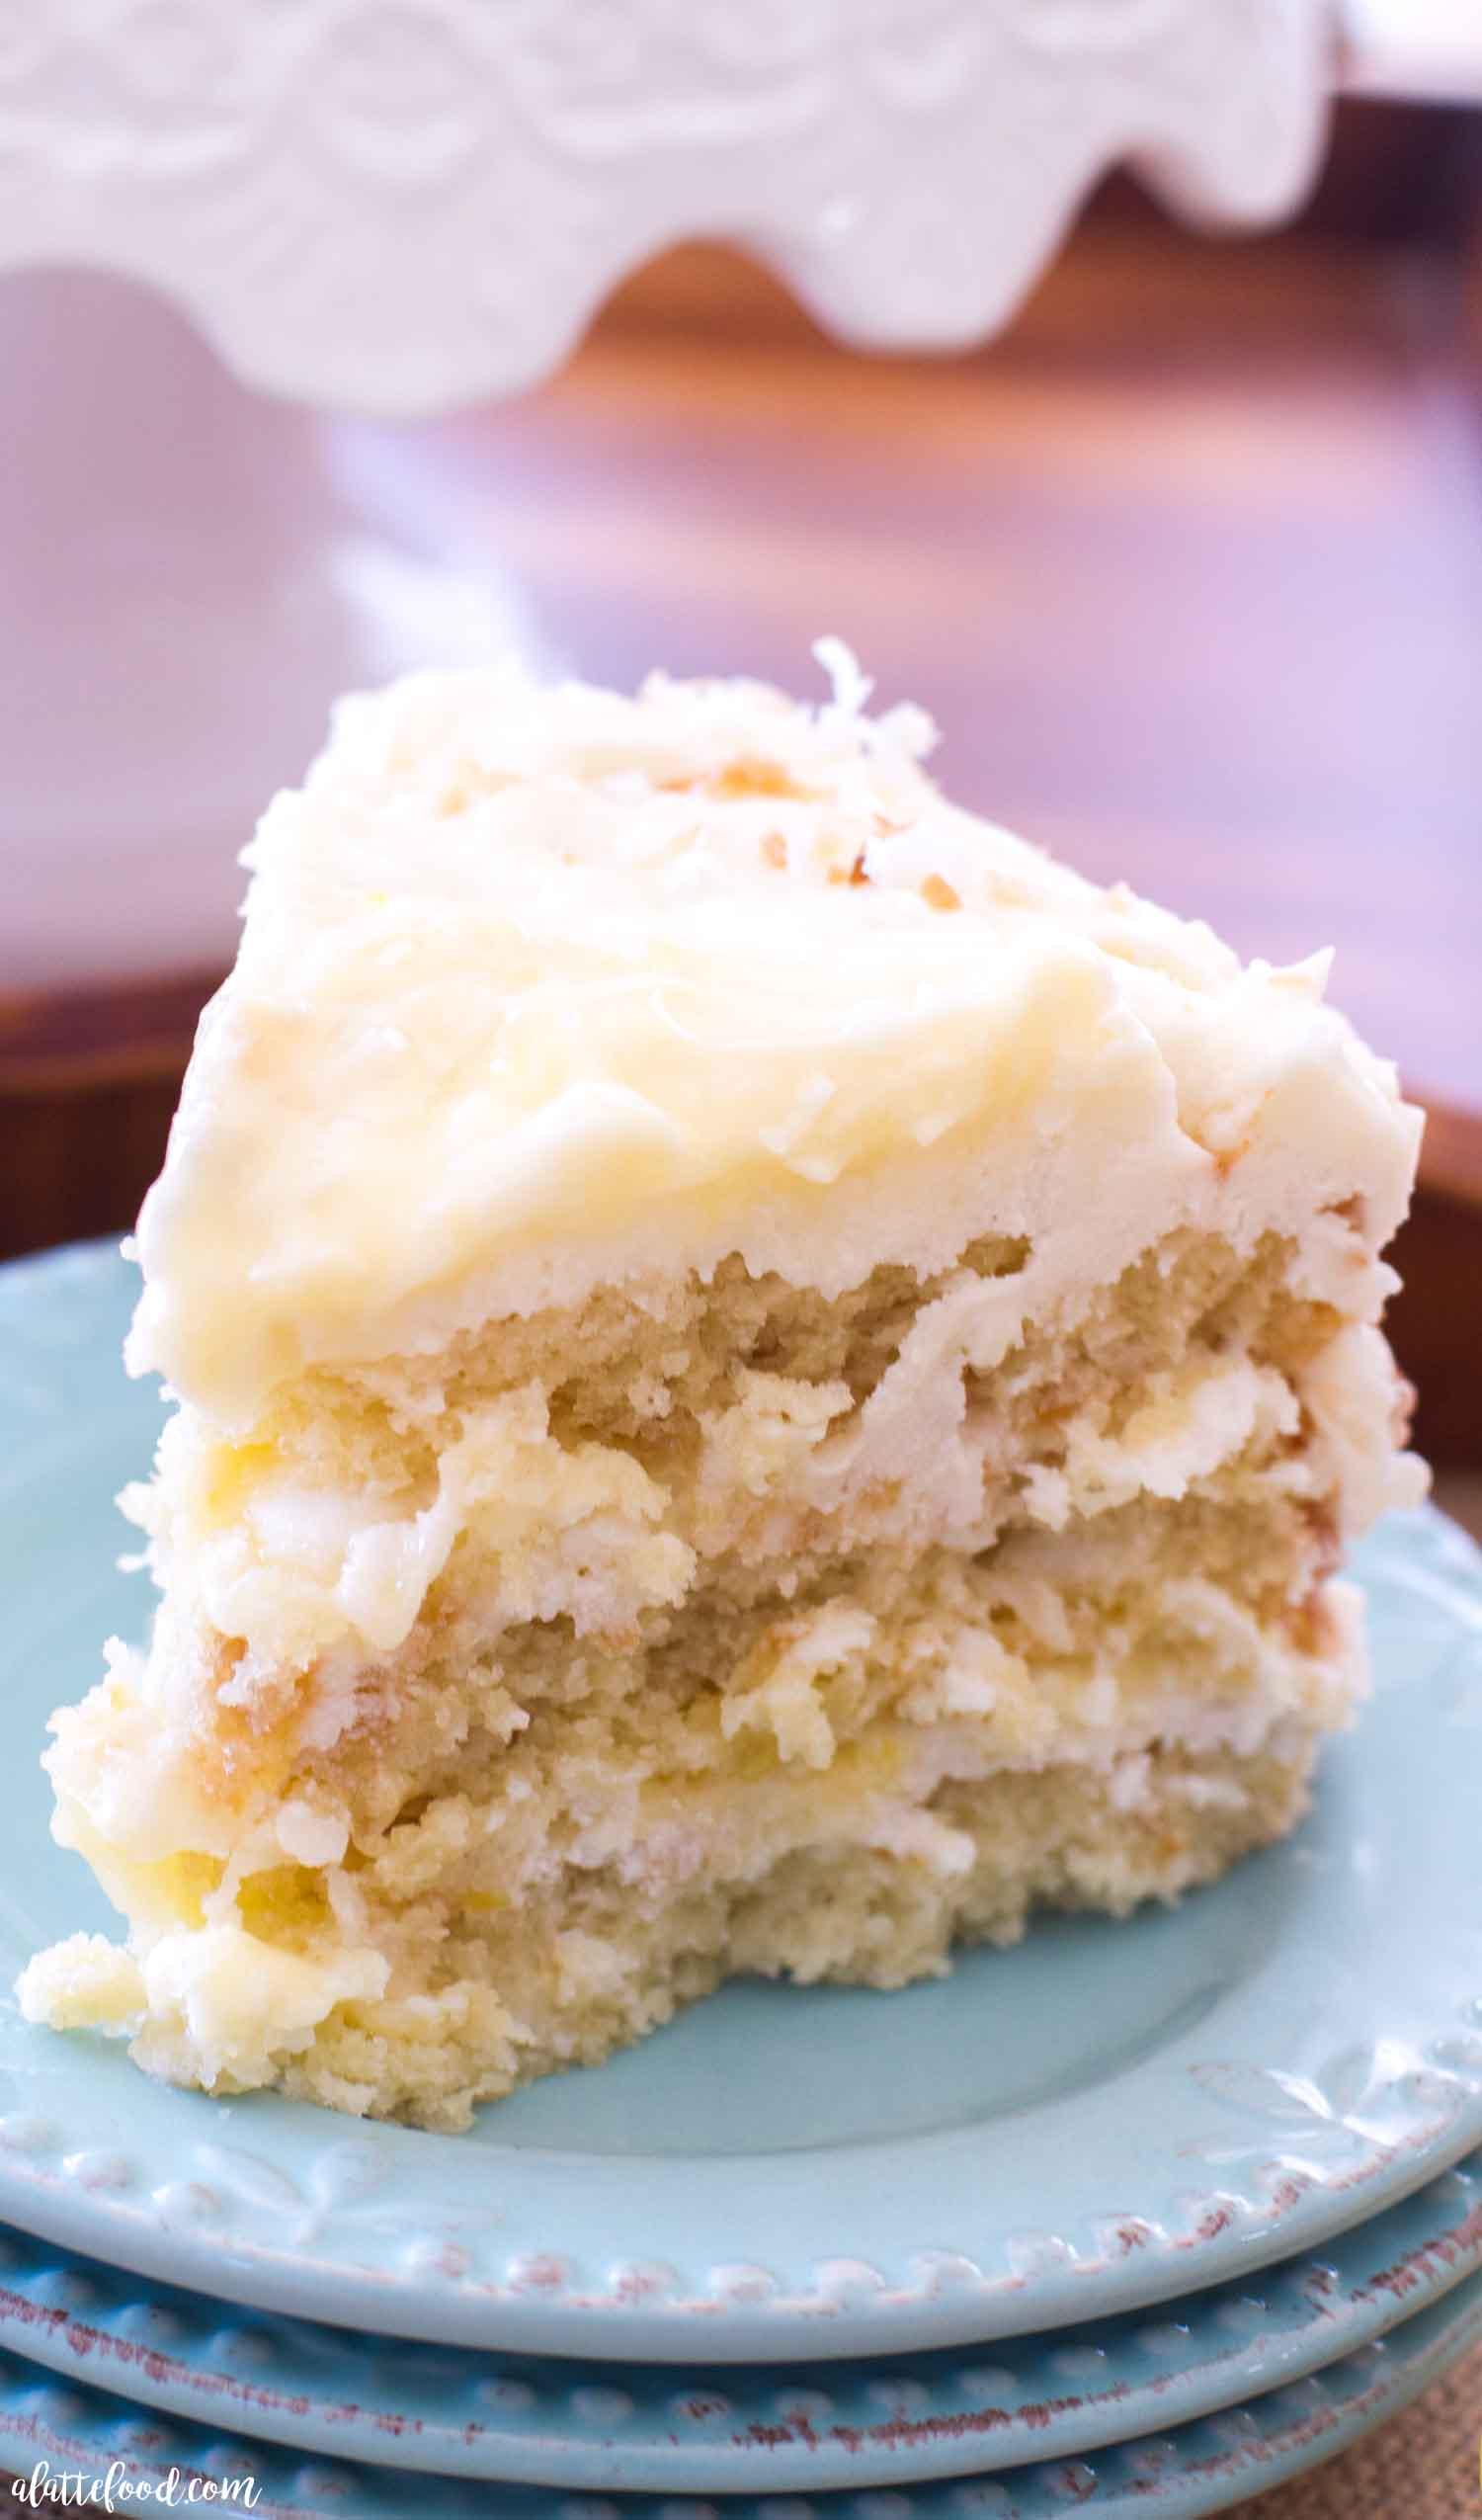 Swell Lemon Coconut Cake A Latte Food Personalised Birthday Cards Beptaeletsinfo